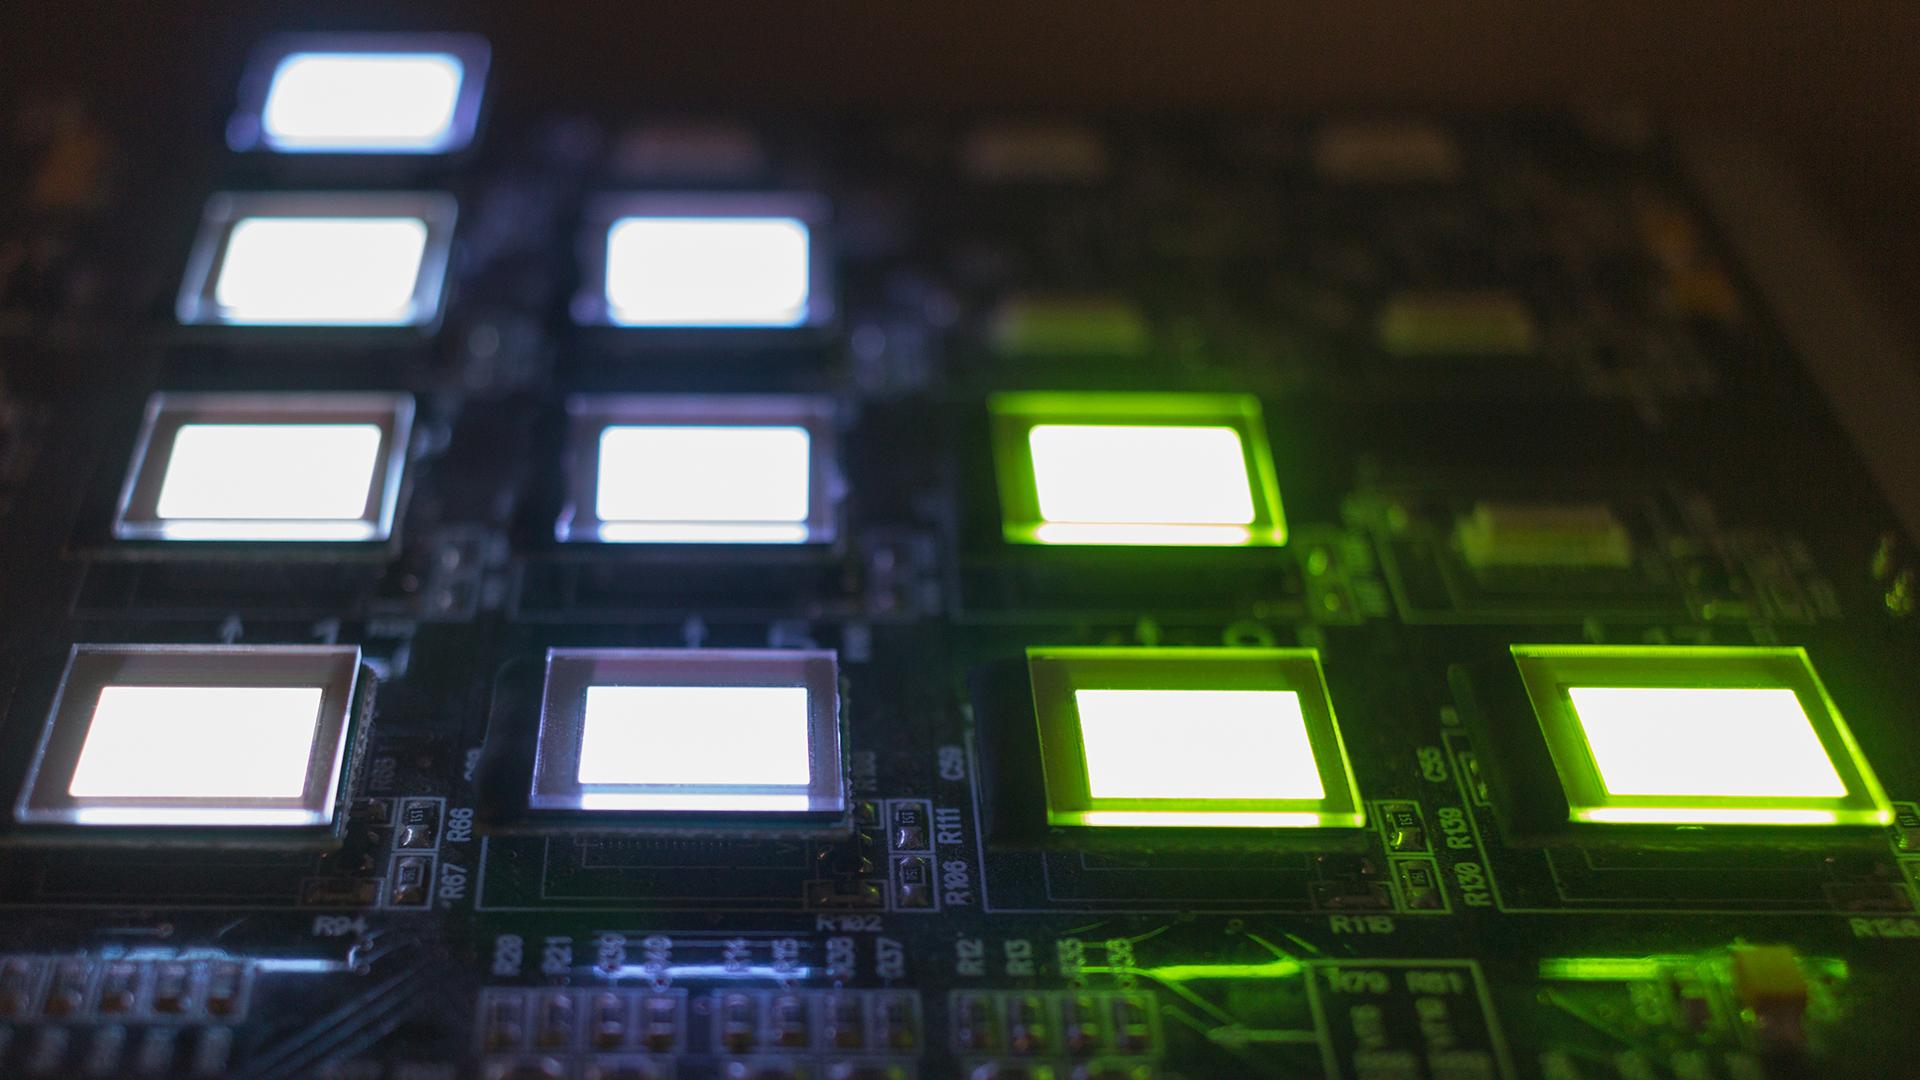 OLED Pixel - Organische Leuchtdioden - OLED vs QLED